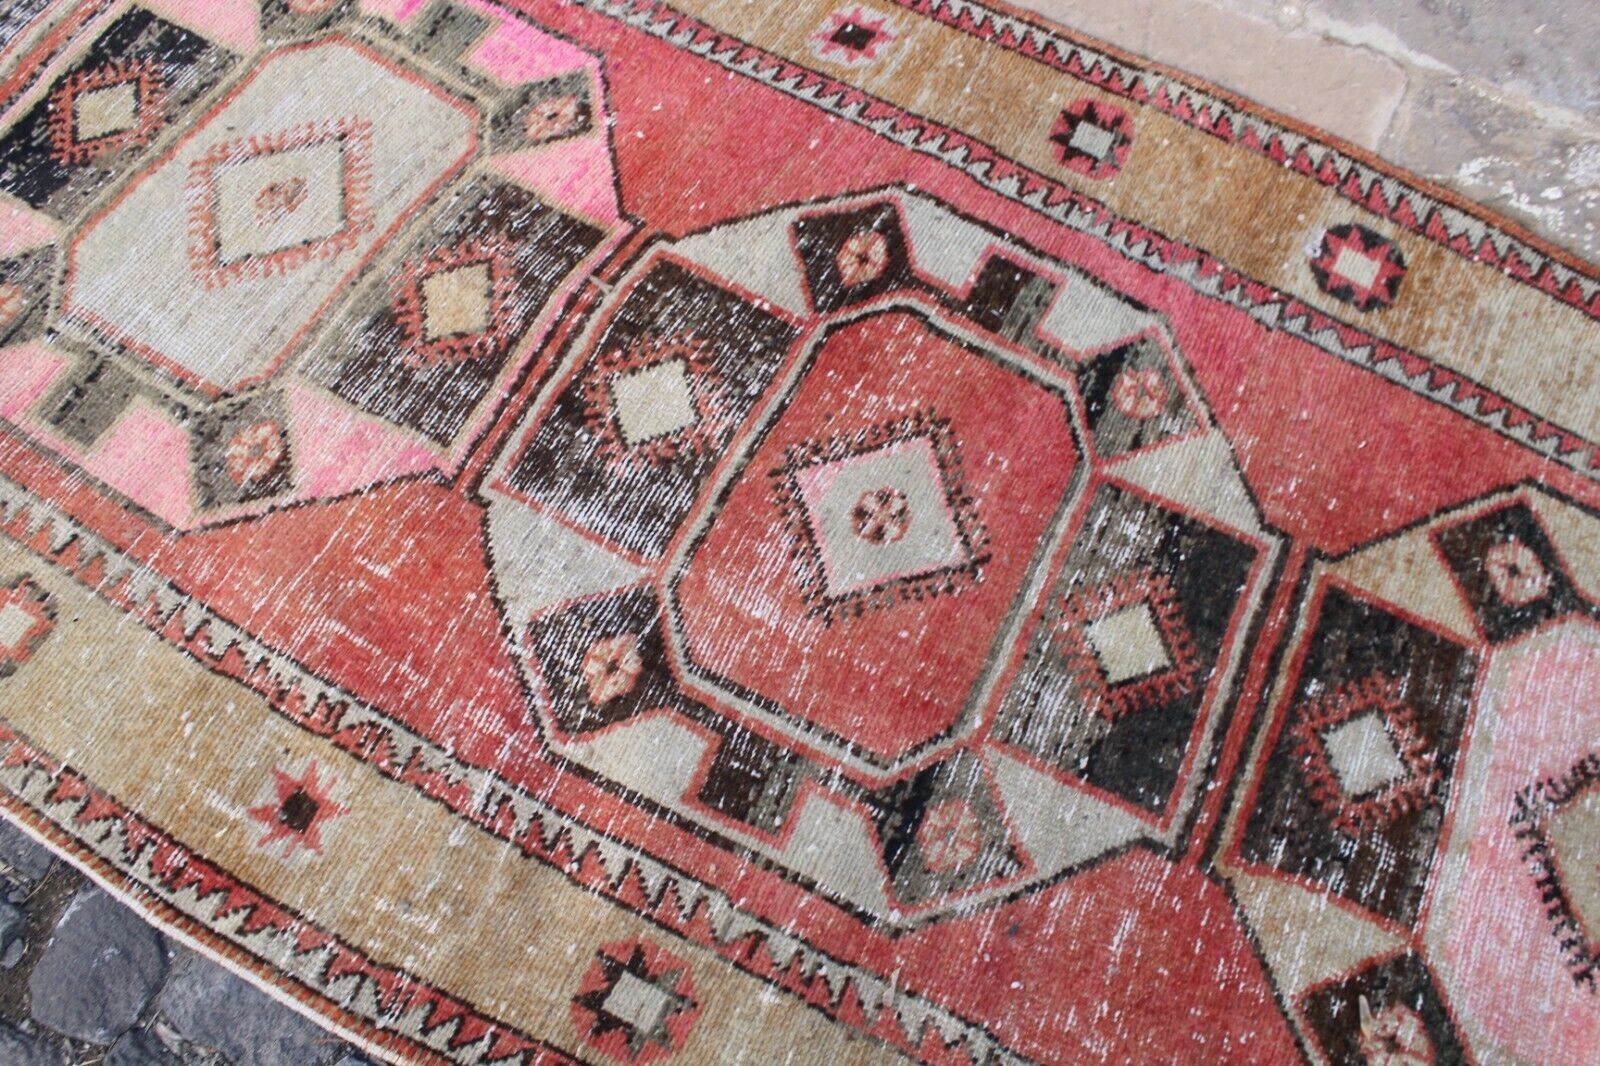 Vintage Handmade Turkish Oushak Runner Rug Rug Rug 12'5 x3'10  7696ae